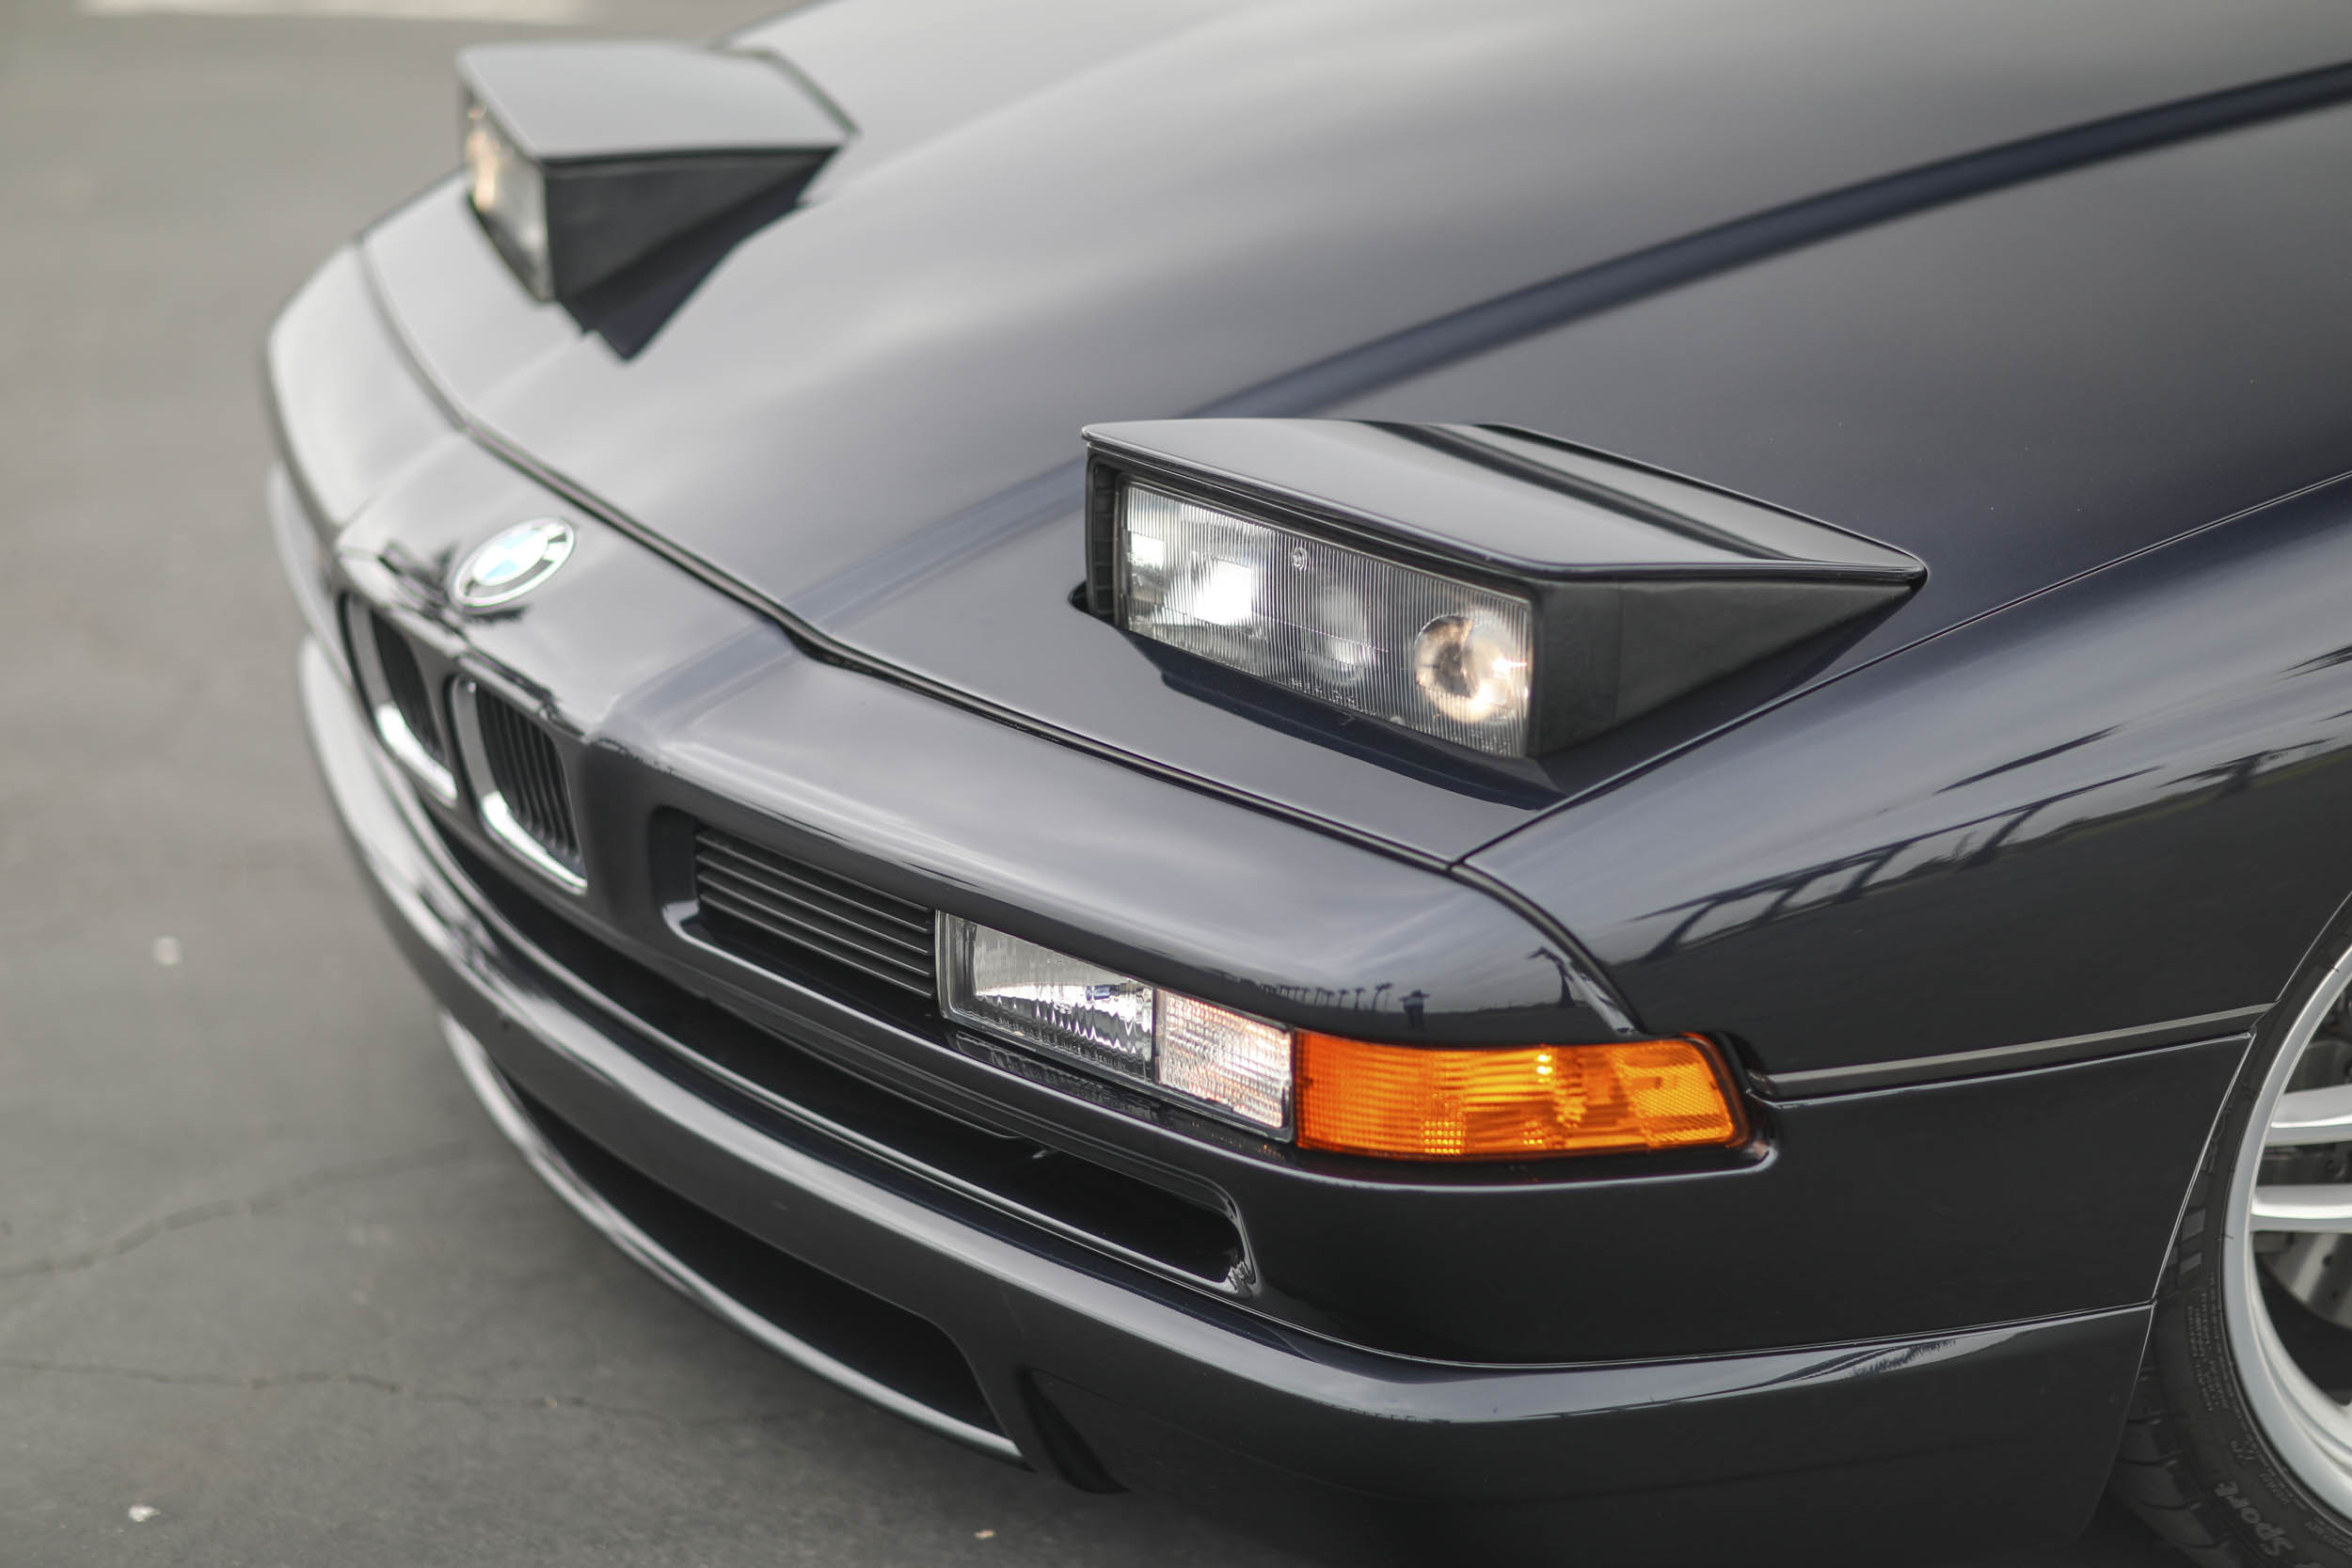 1993 BMW 850Ci headlight detail